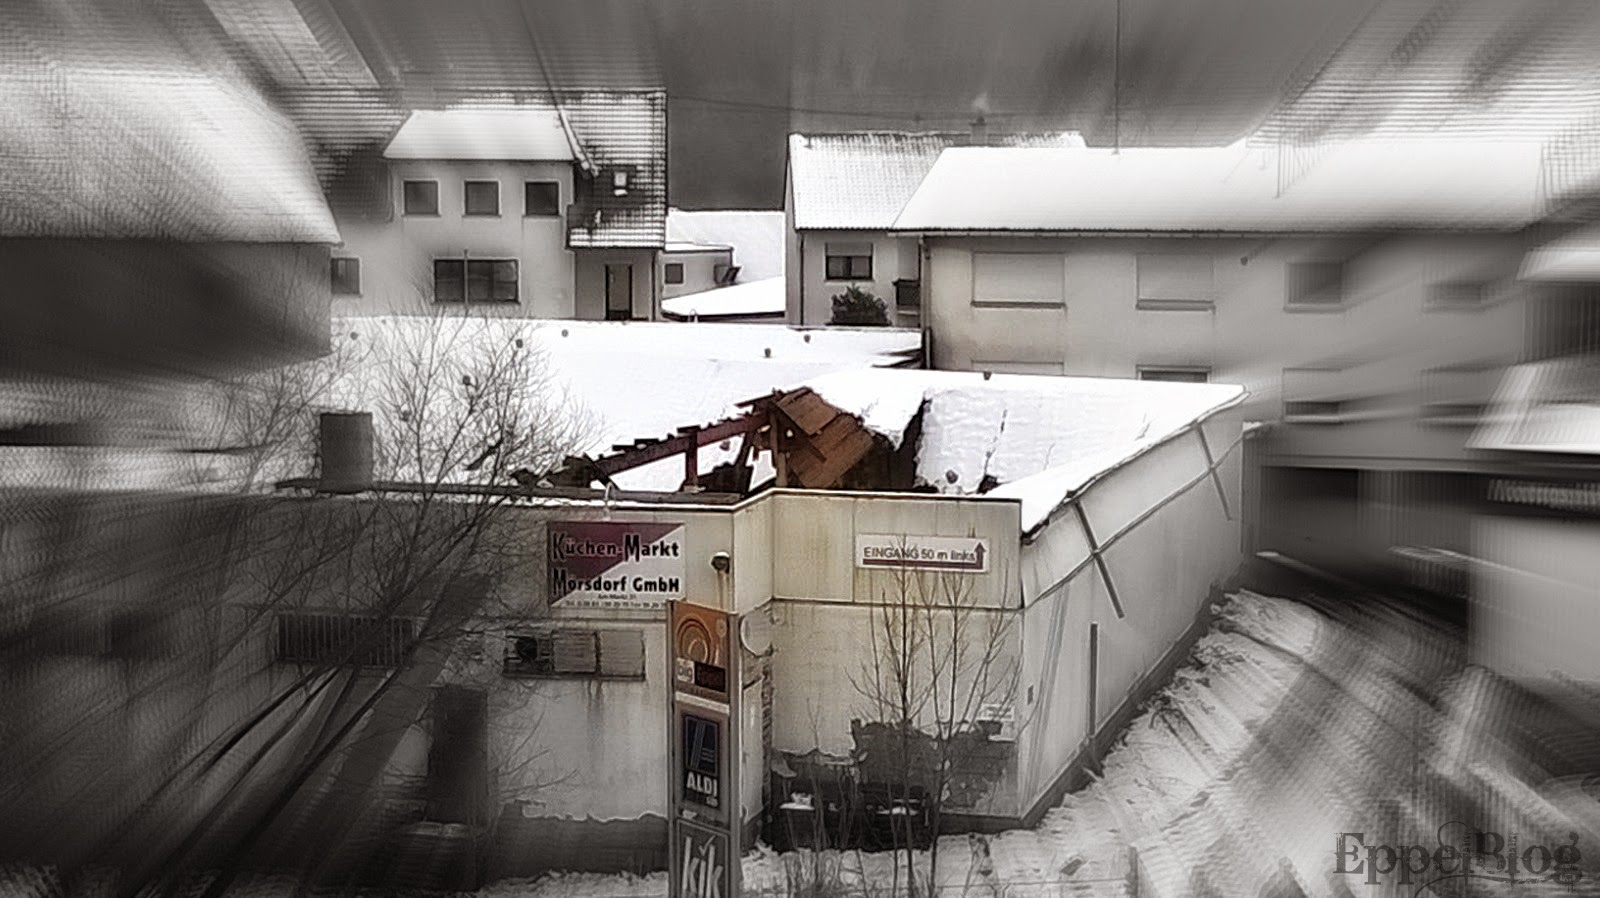 http://eppelblog.blogspot.de/2015/01/alter-markant-teilweise-eingesturzt.html